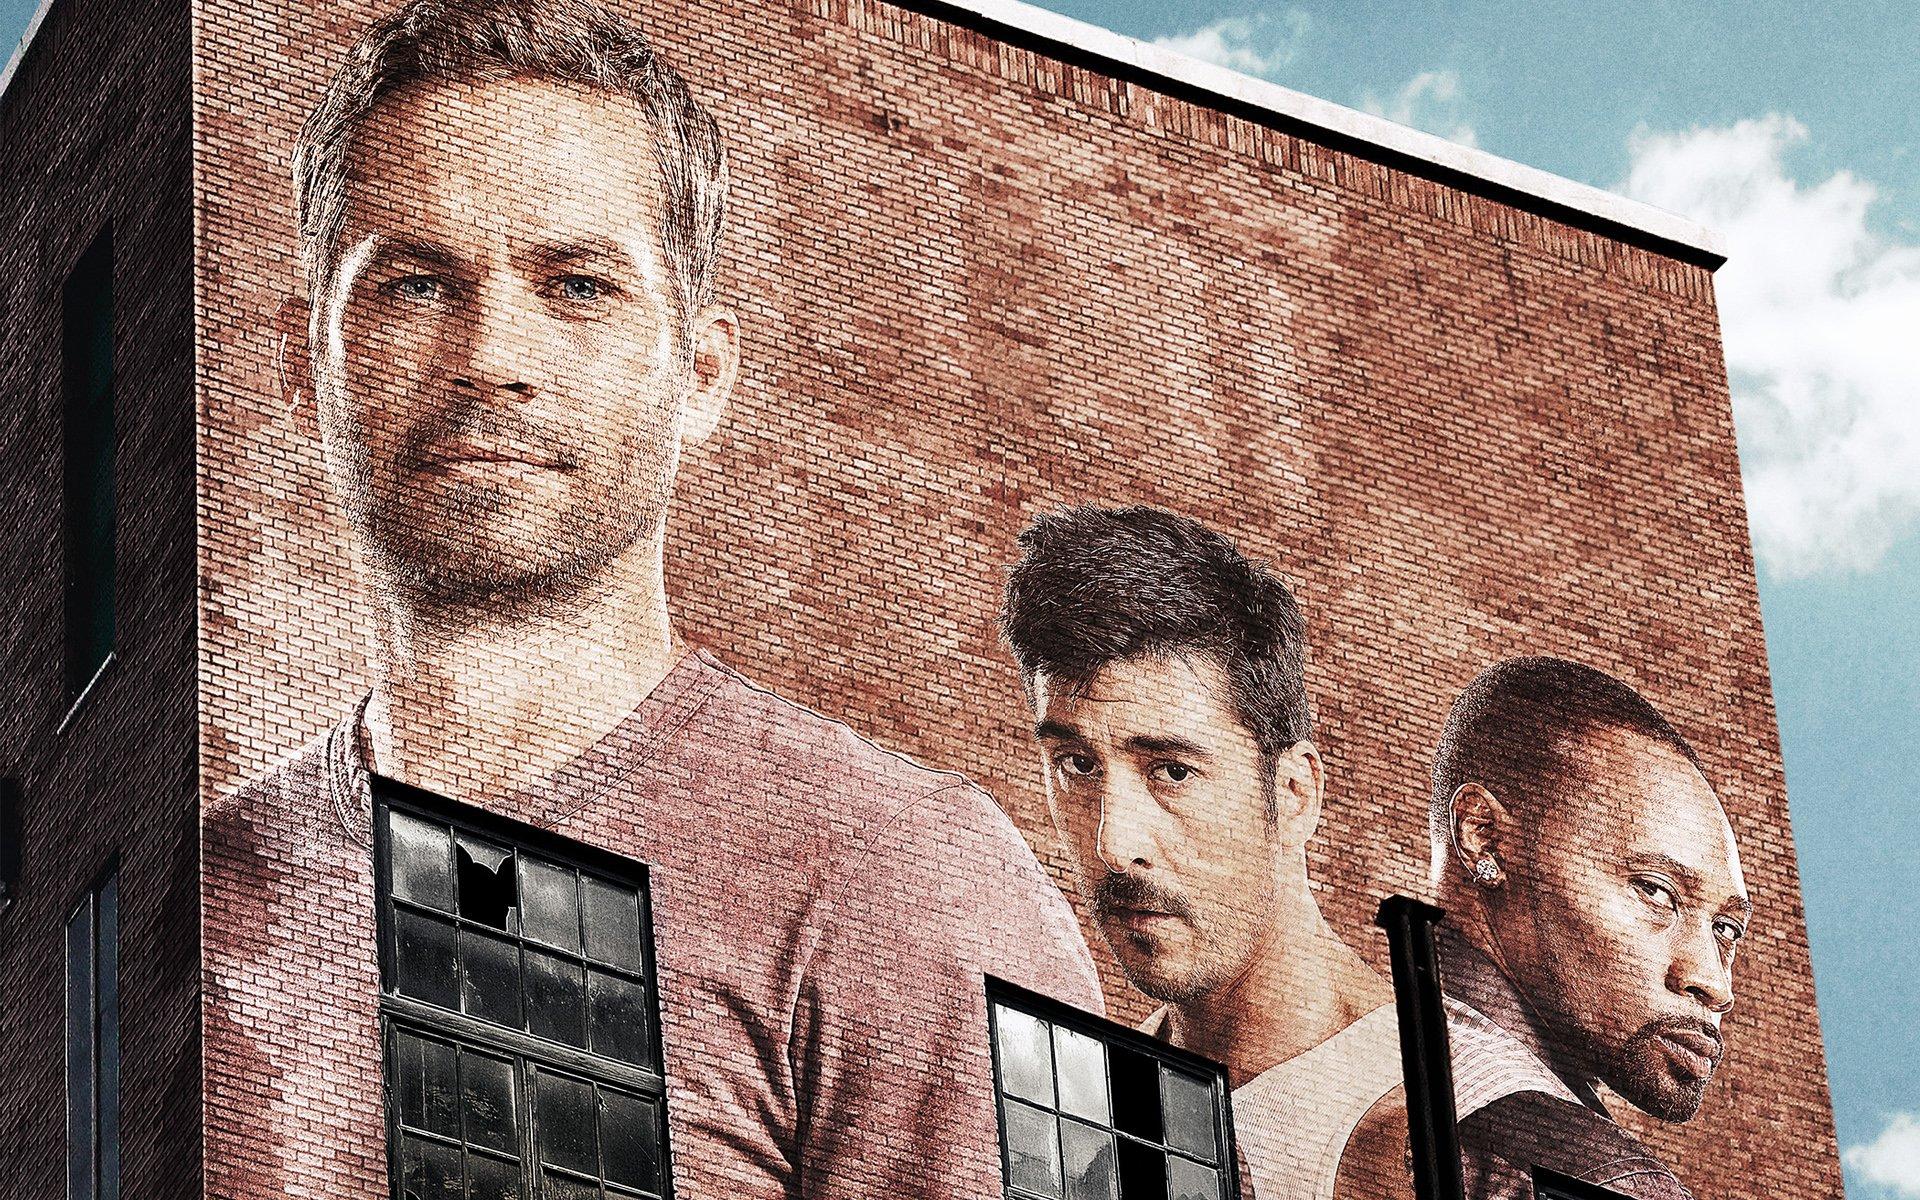 Brick Mansions HD Wallpaper